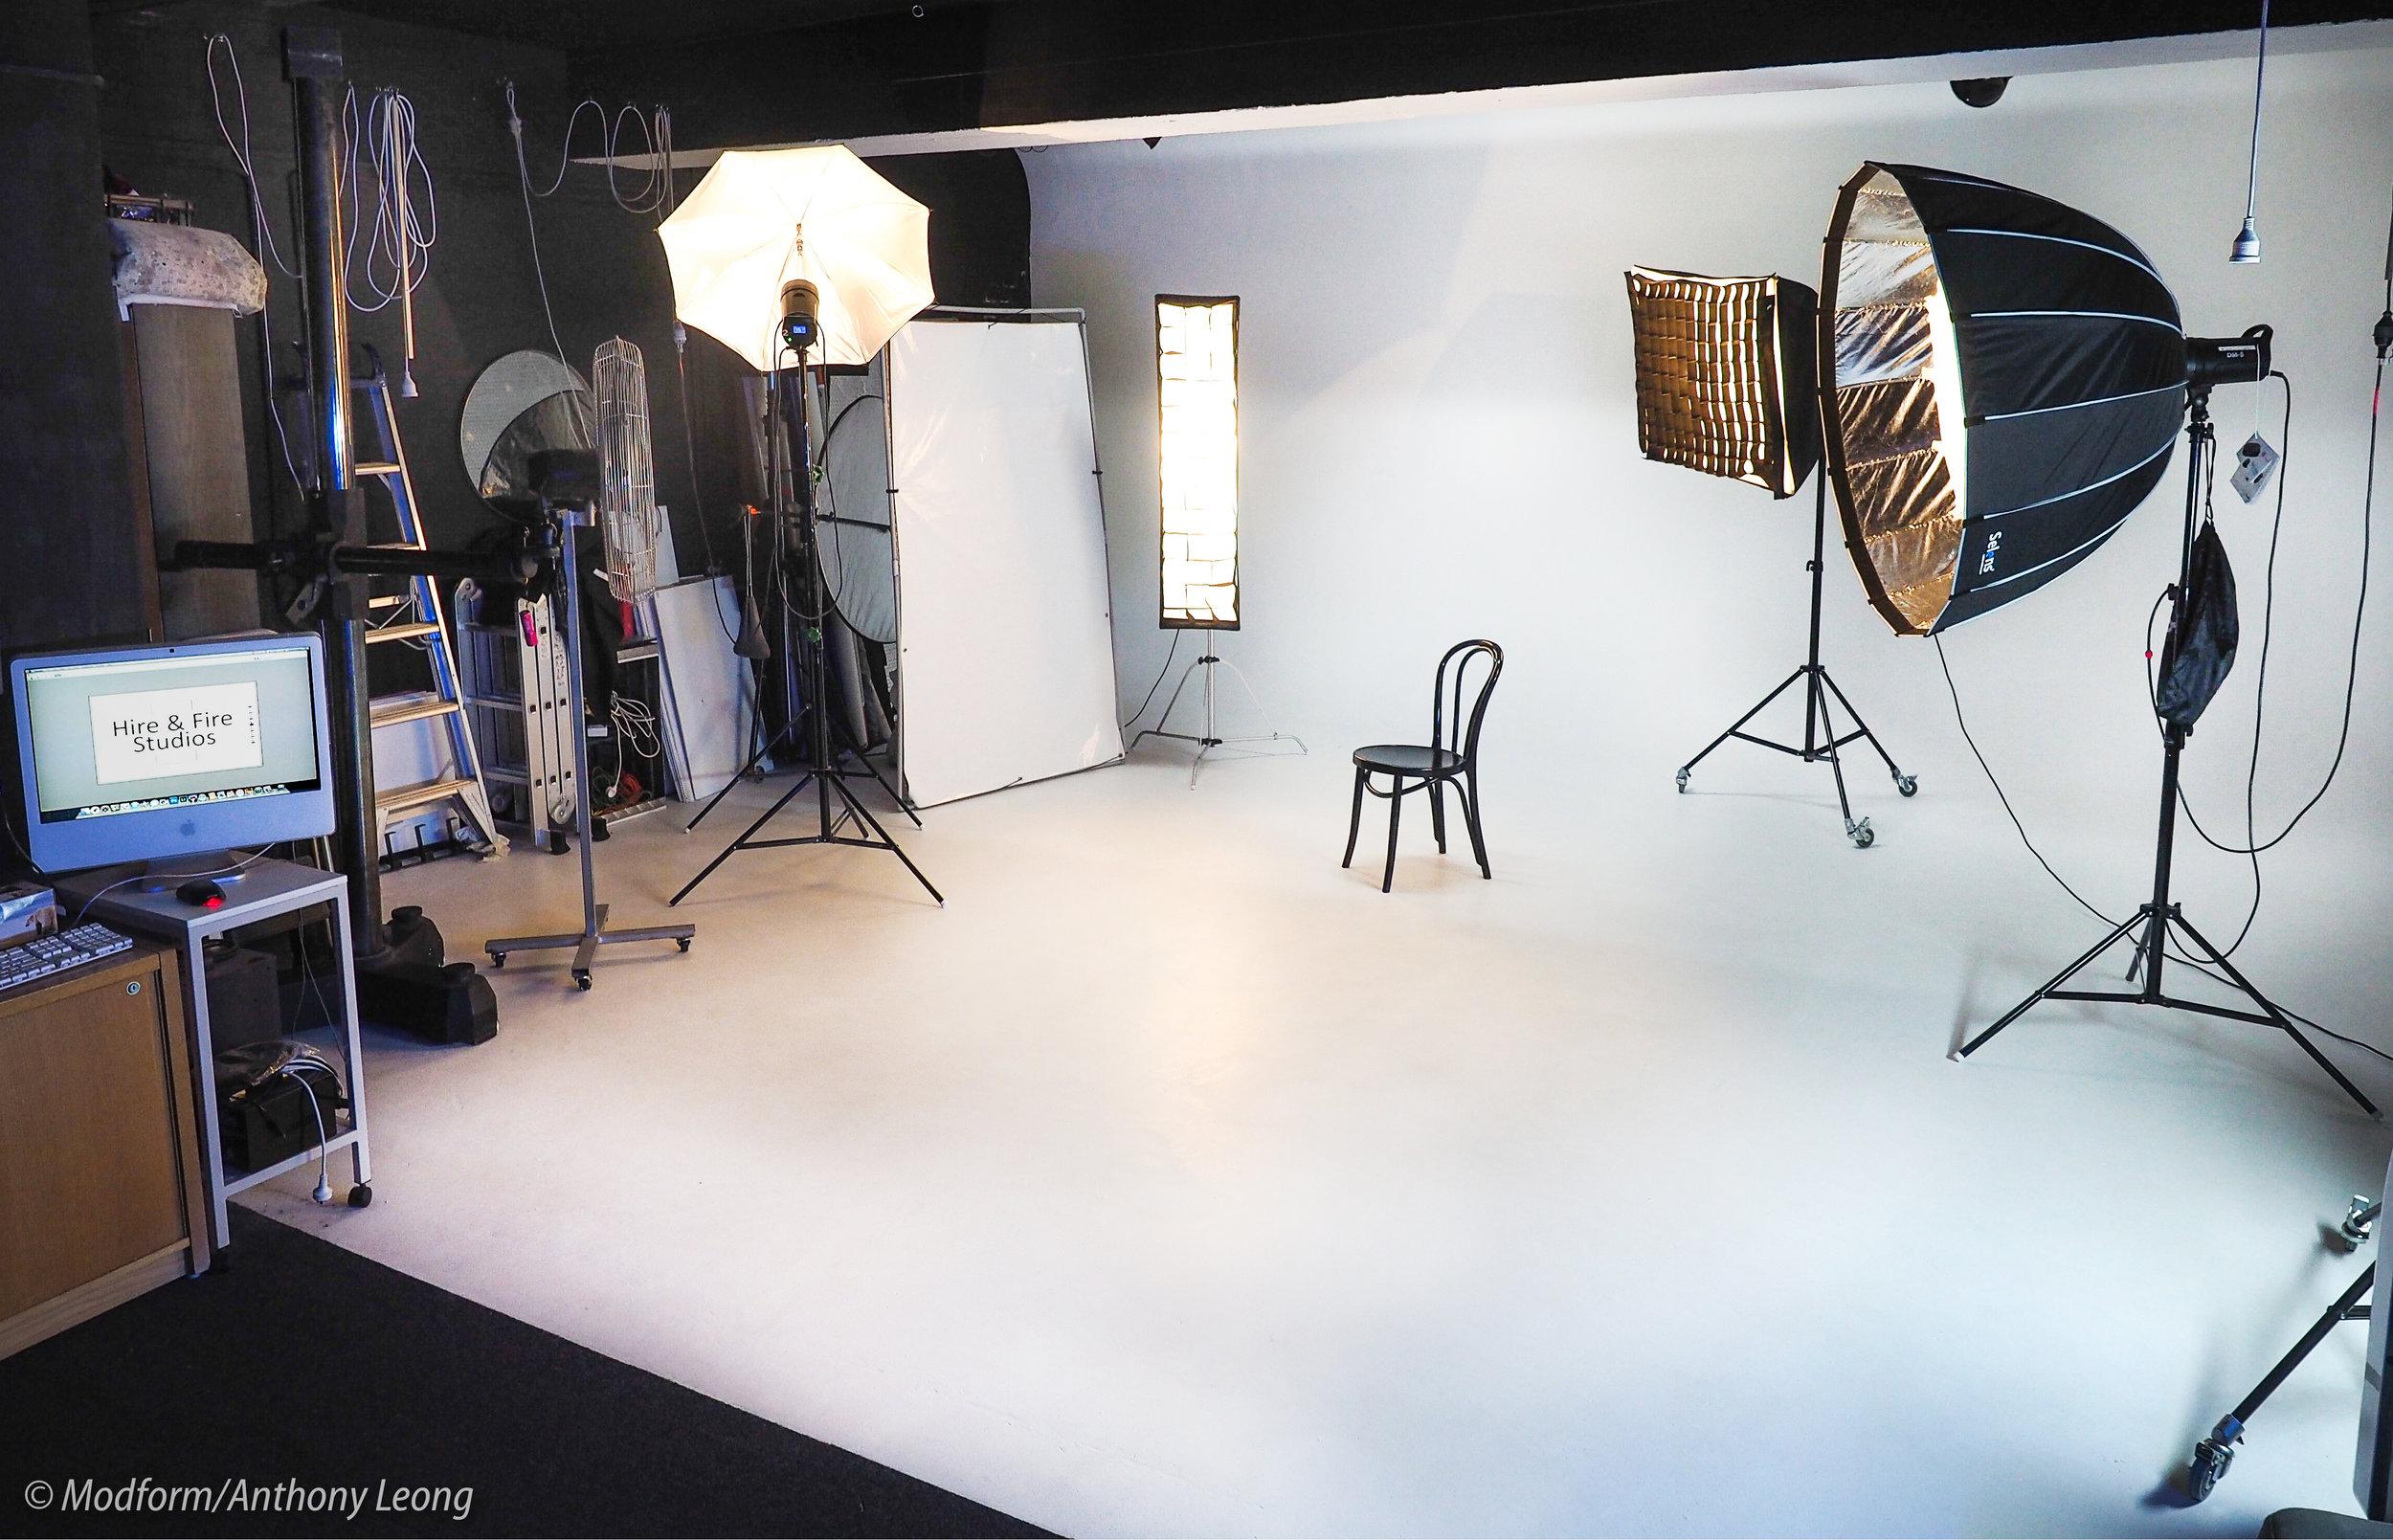 02-Studio interior150519.jpg